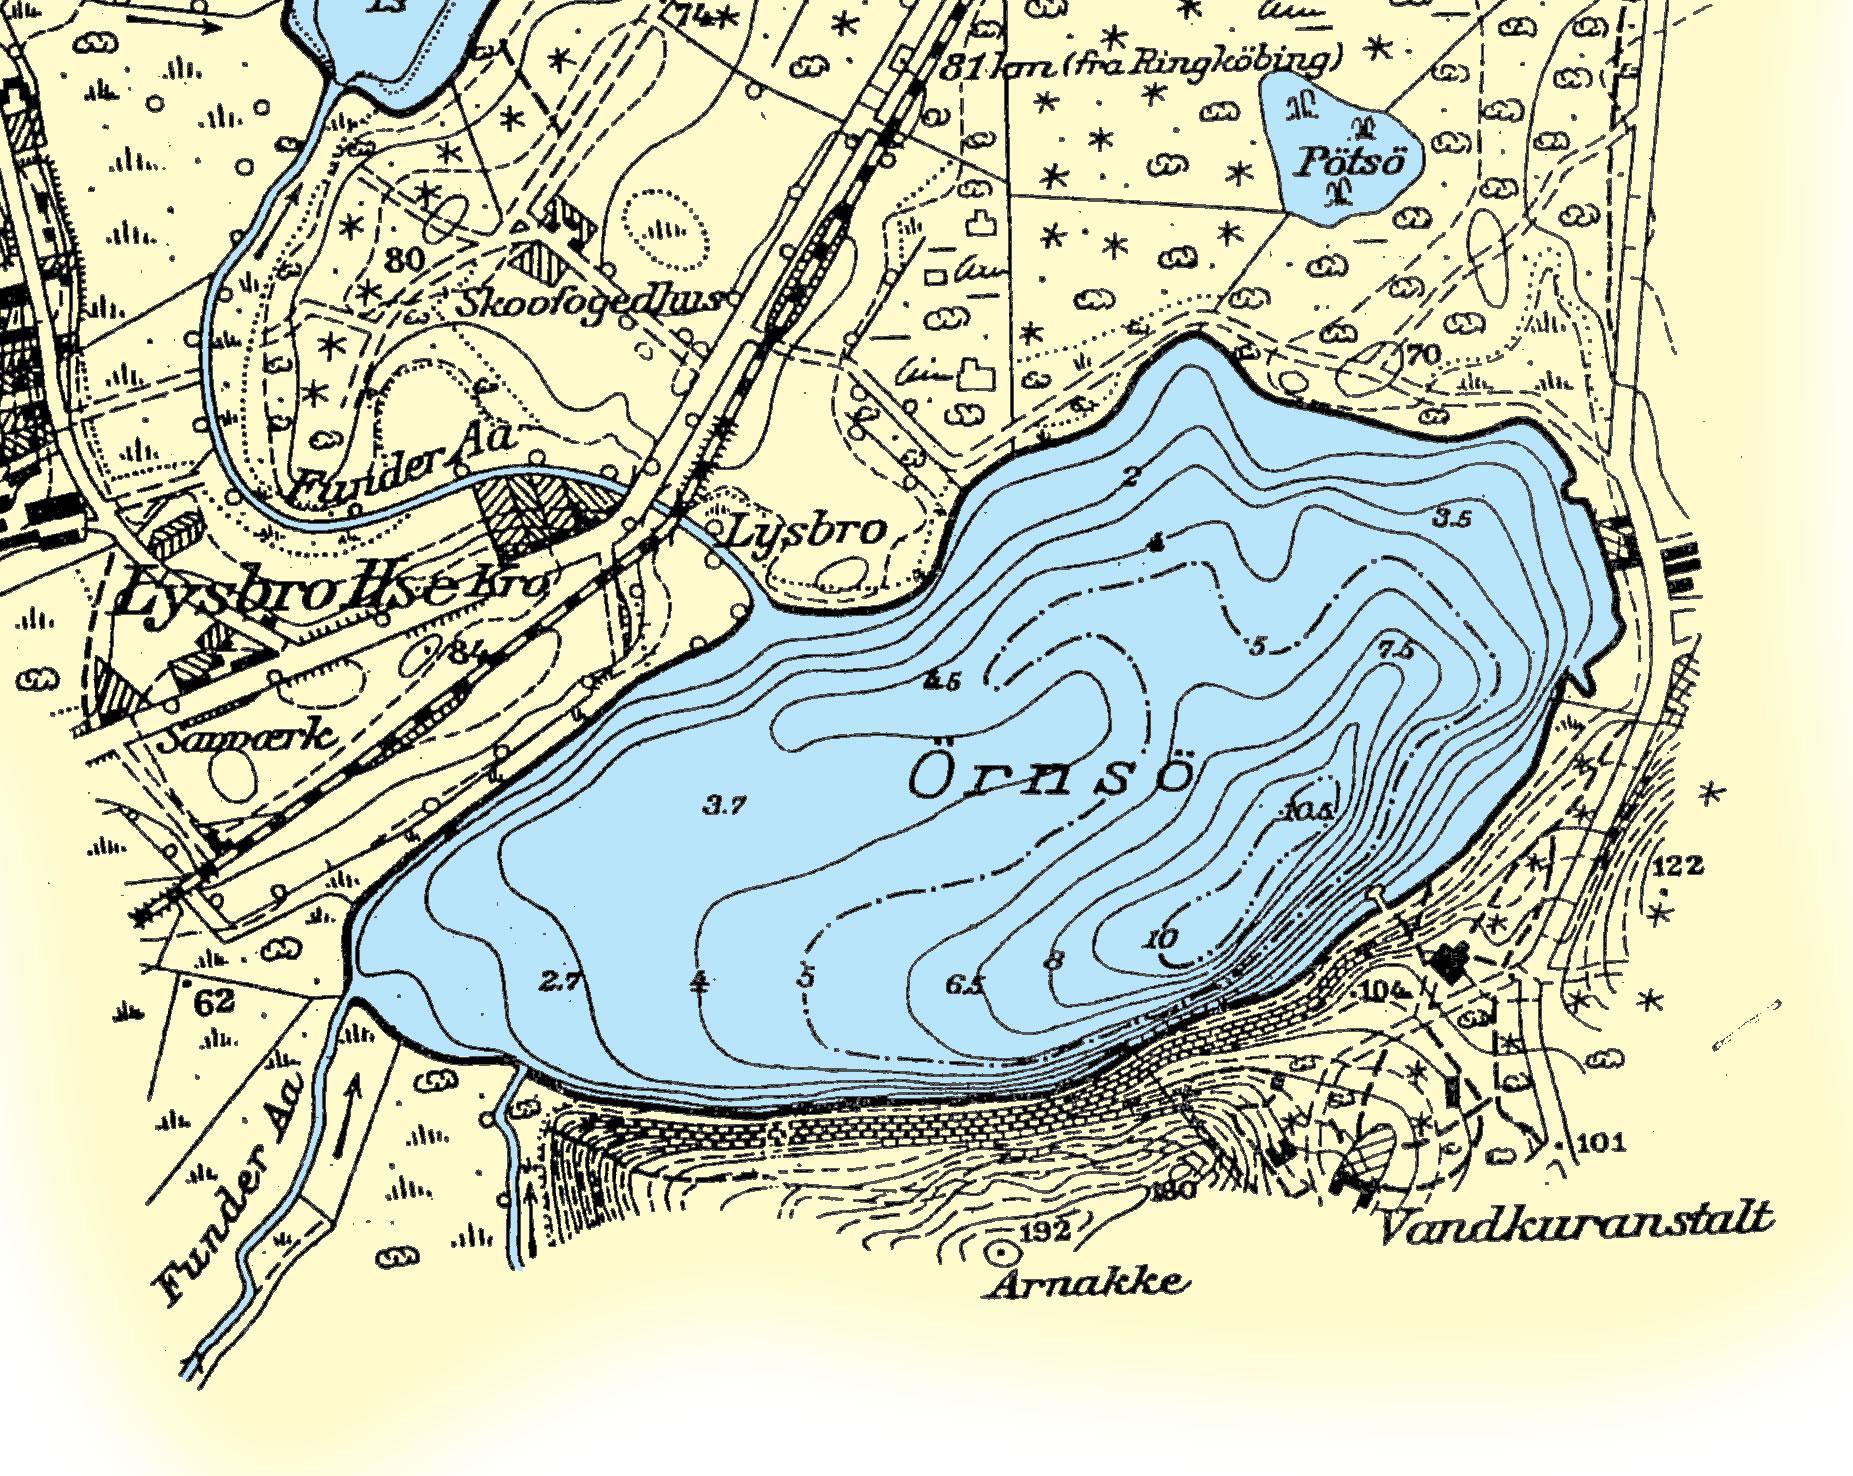 Gamle Dybdekort Silkeborg Fiskeriforening